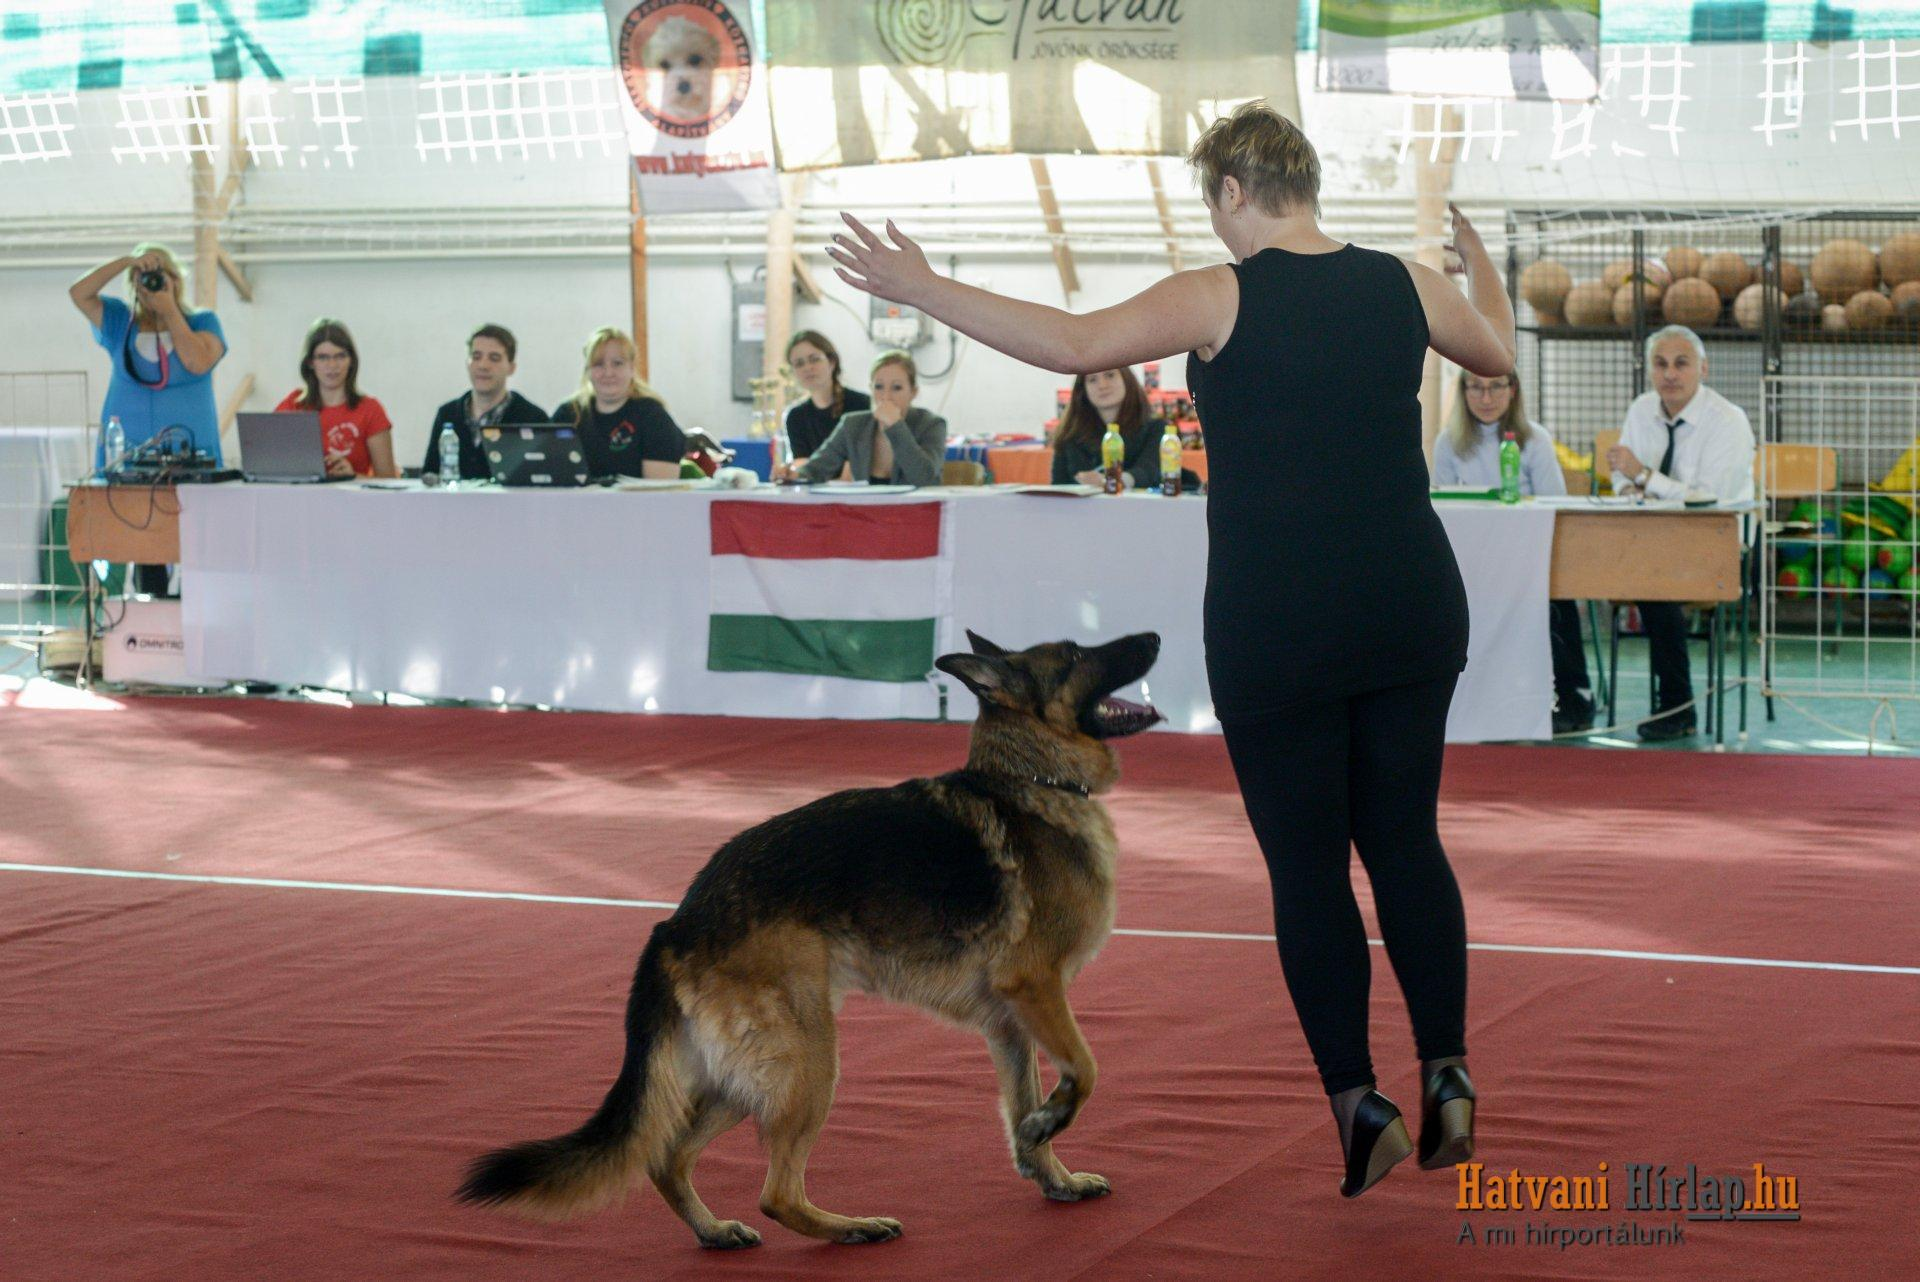 dog_dancing_01